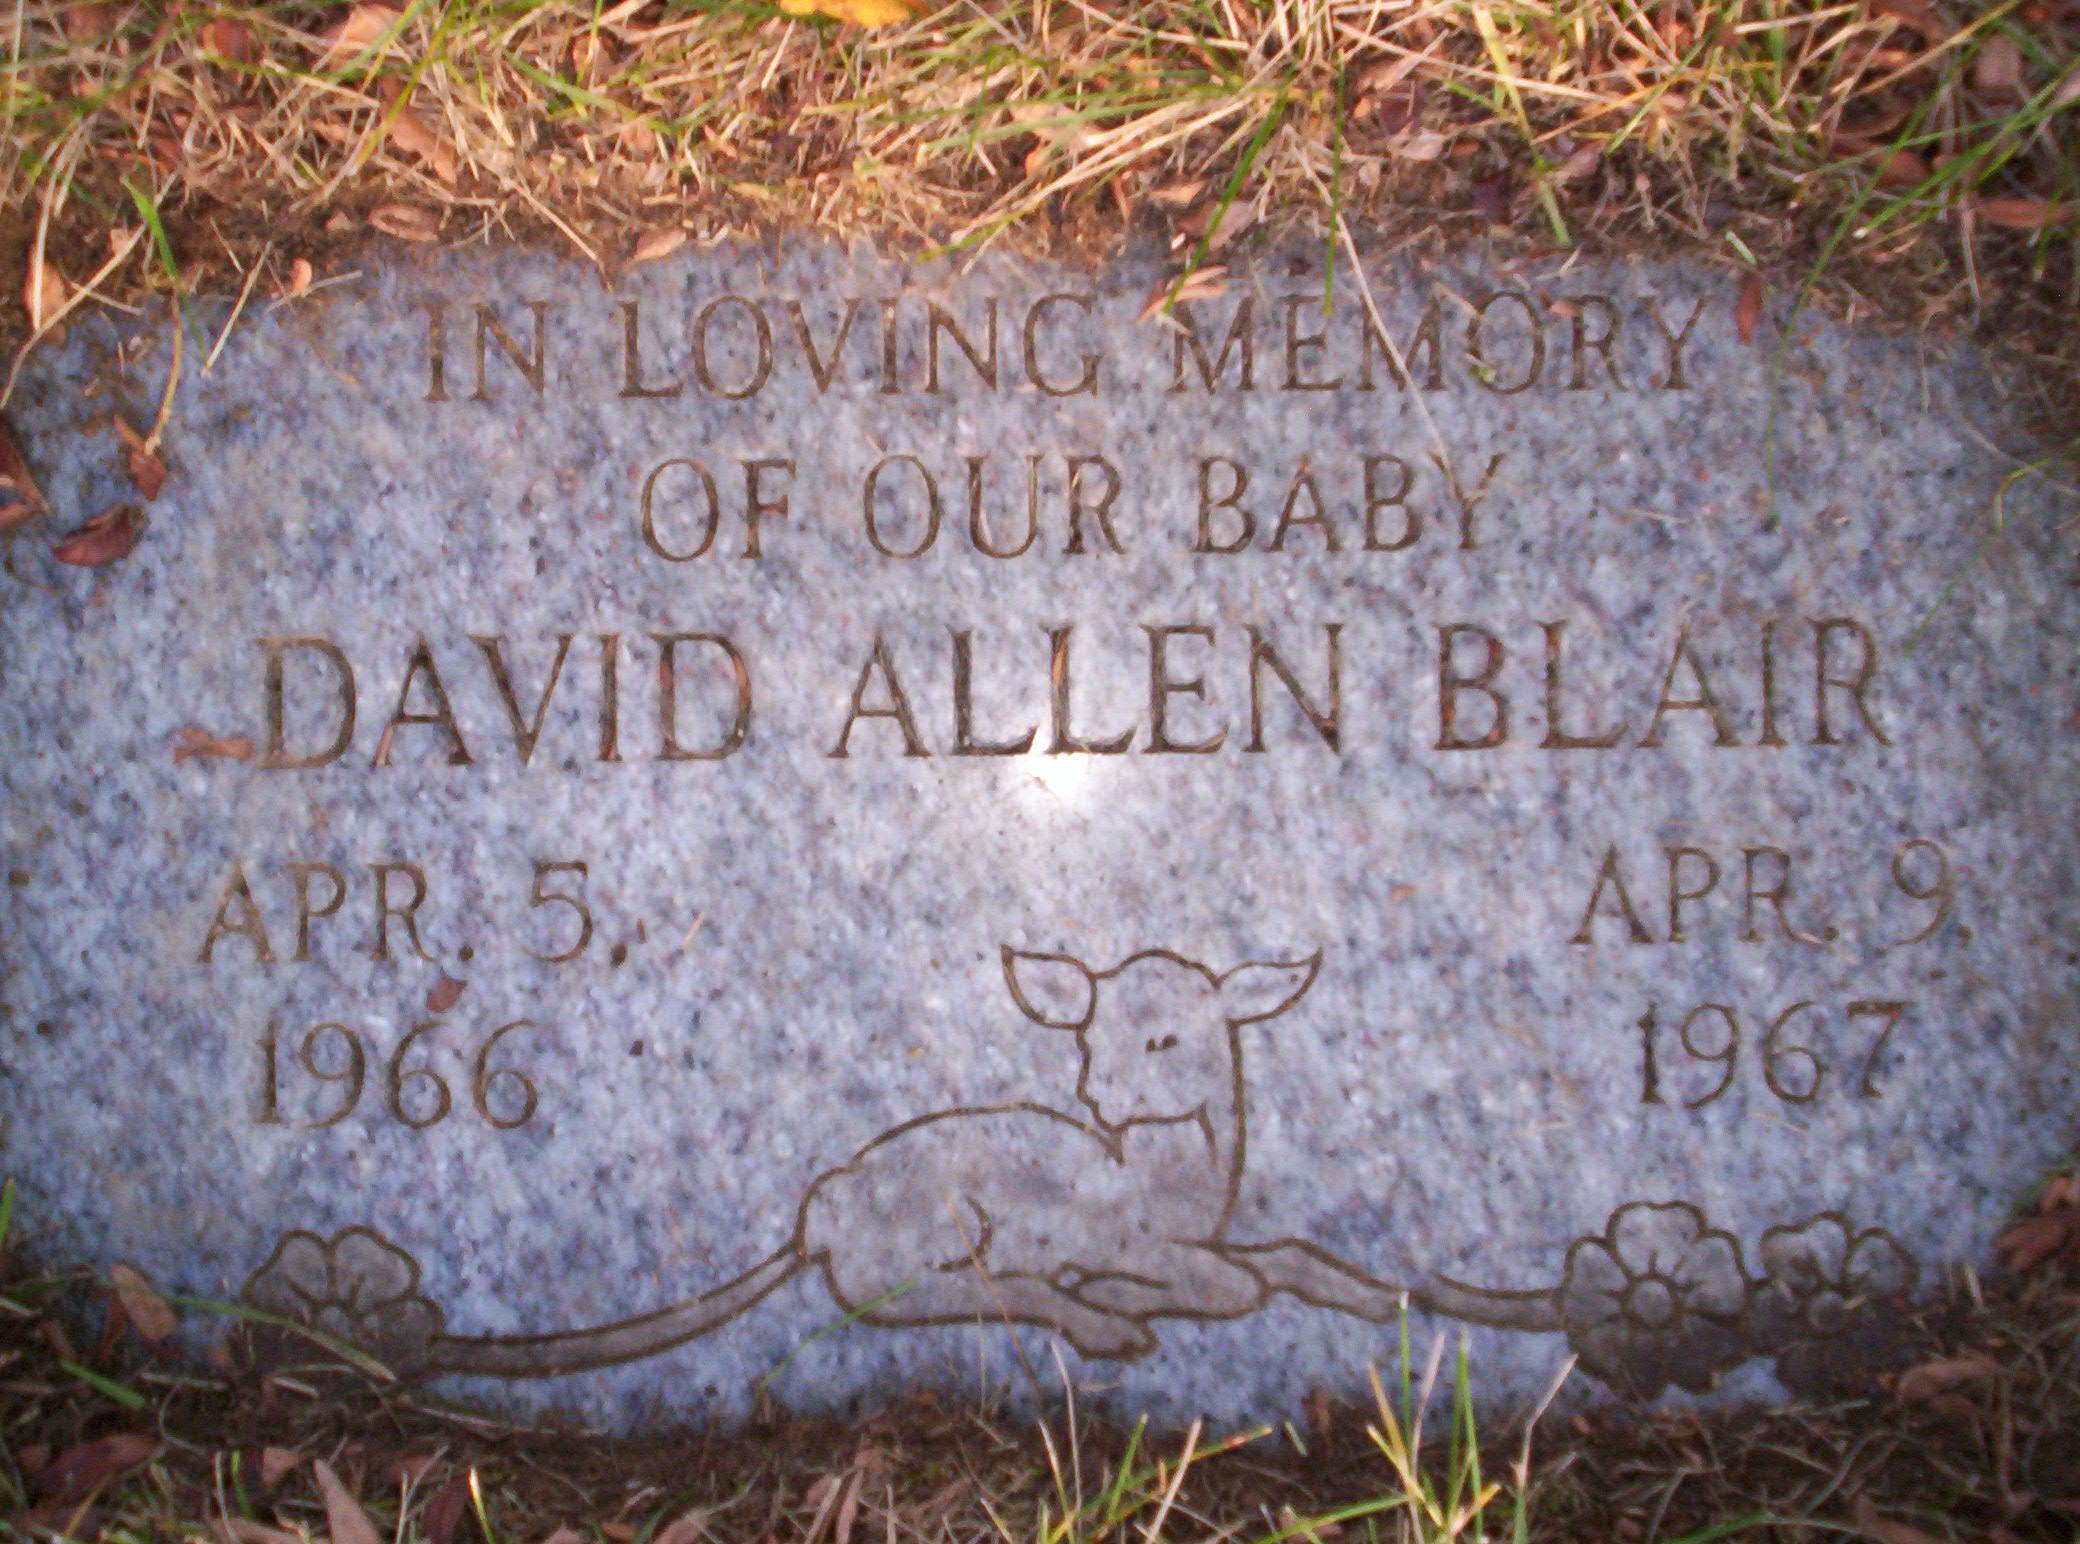 Allen Blair